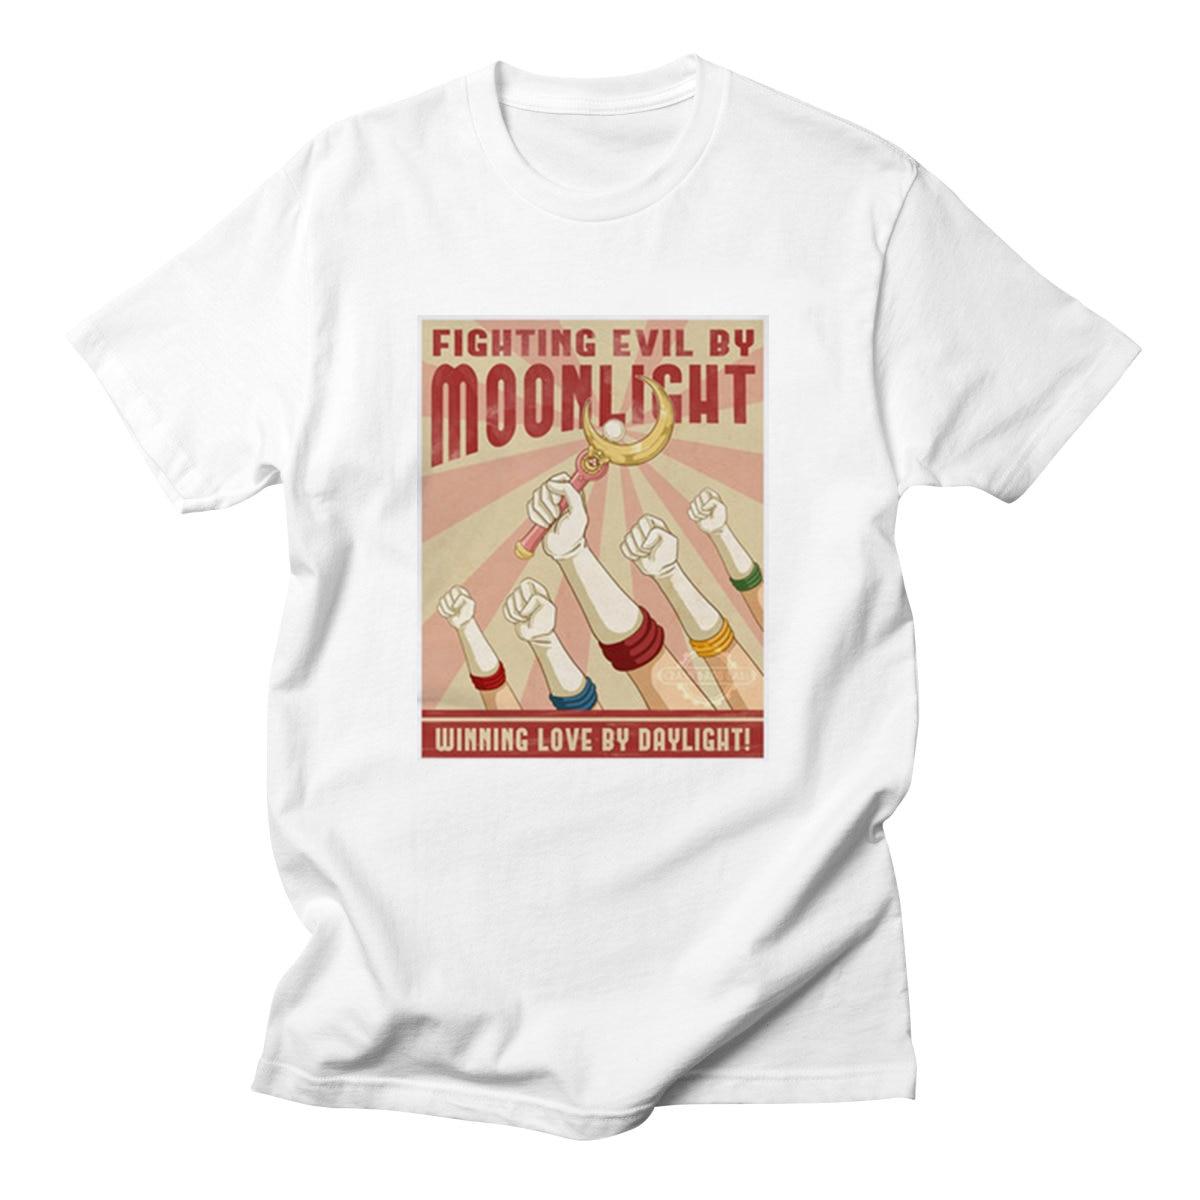 Camisetas Sailor Moon, estampado de moda para hombre, camiseta para hombre con Gato, verano 2020, divertida camiseta Rosa adorable, camisetas Kawaii Harajuku